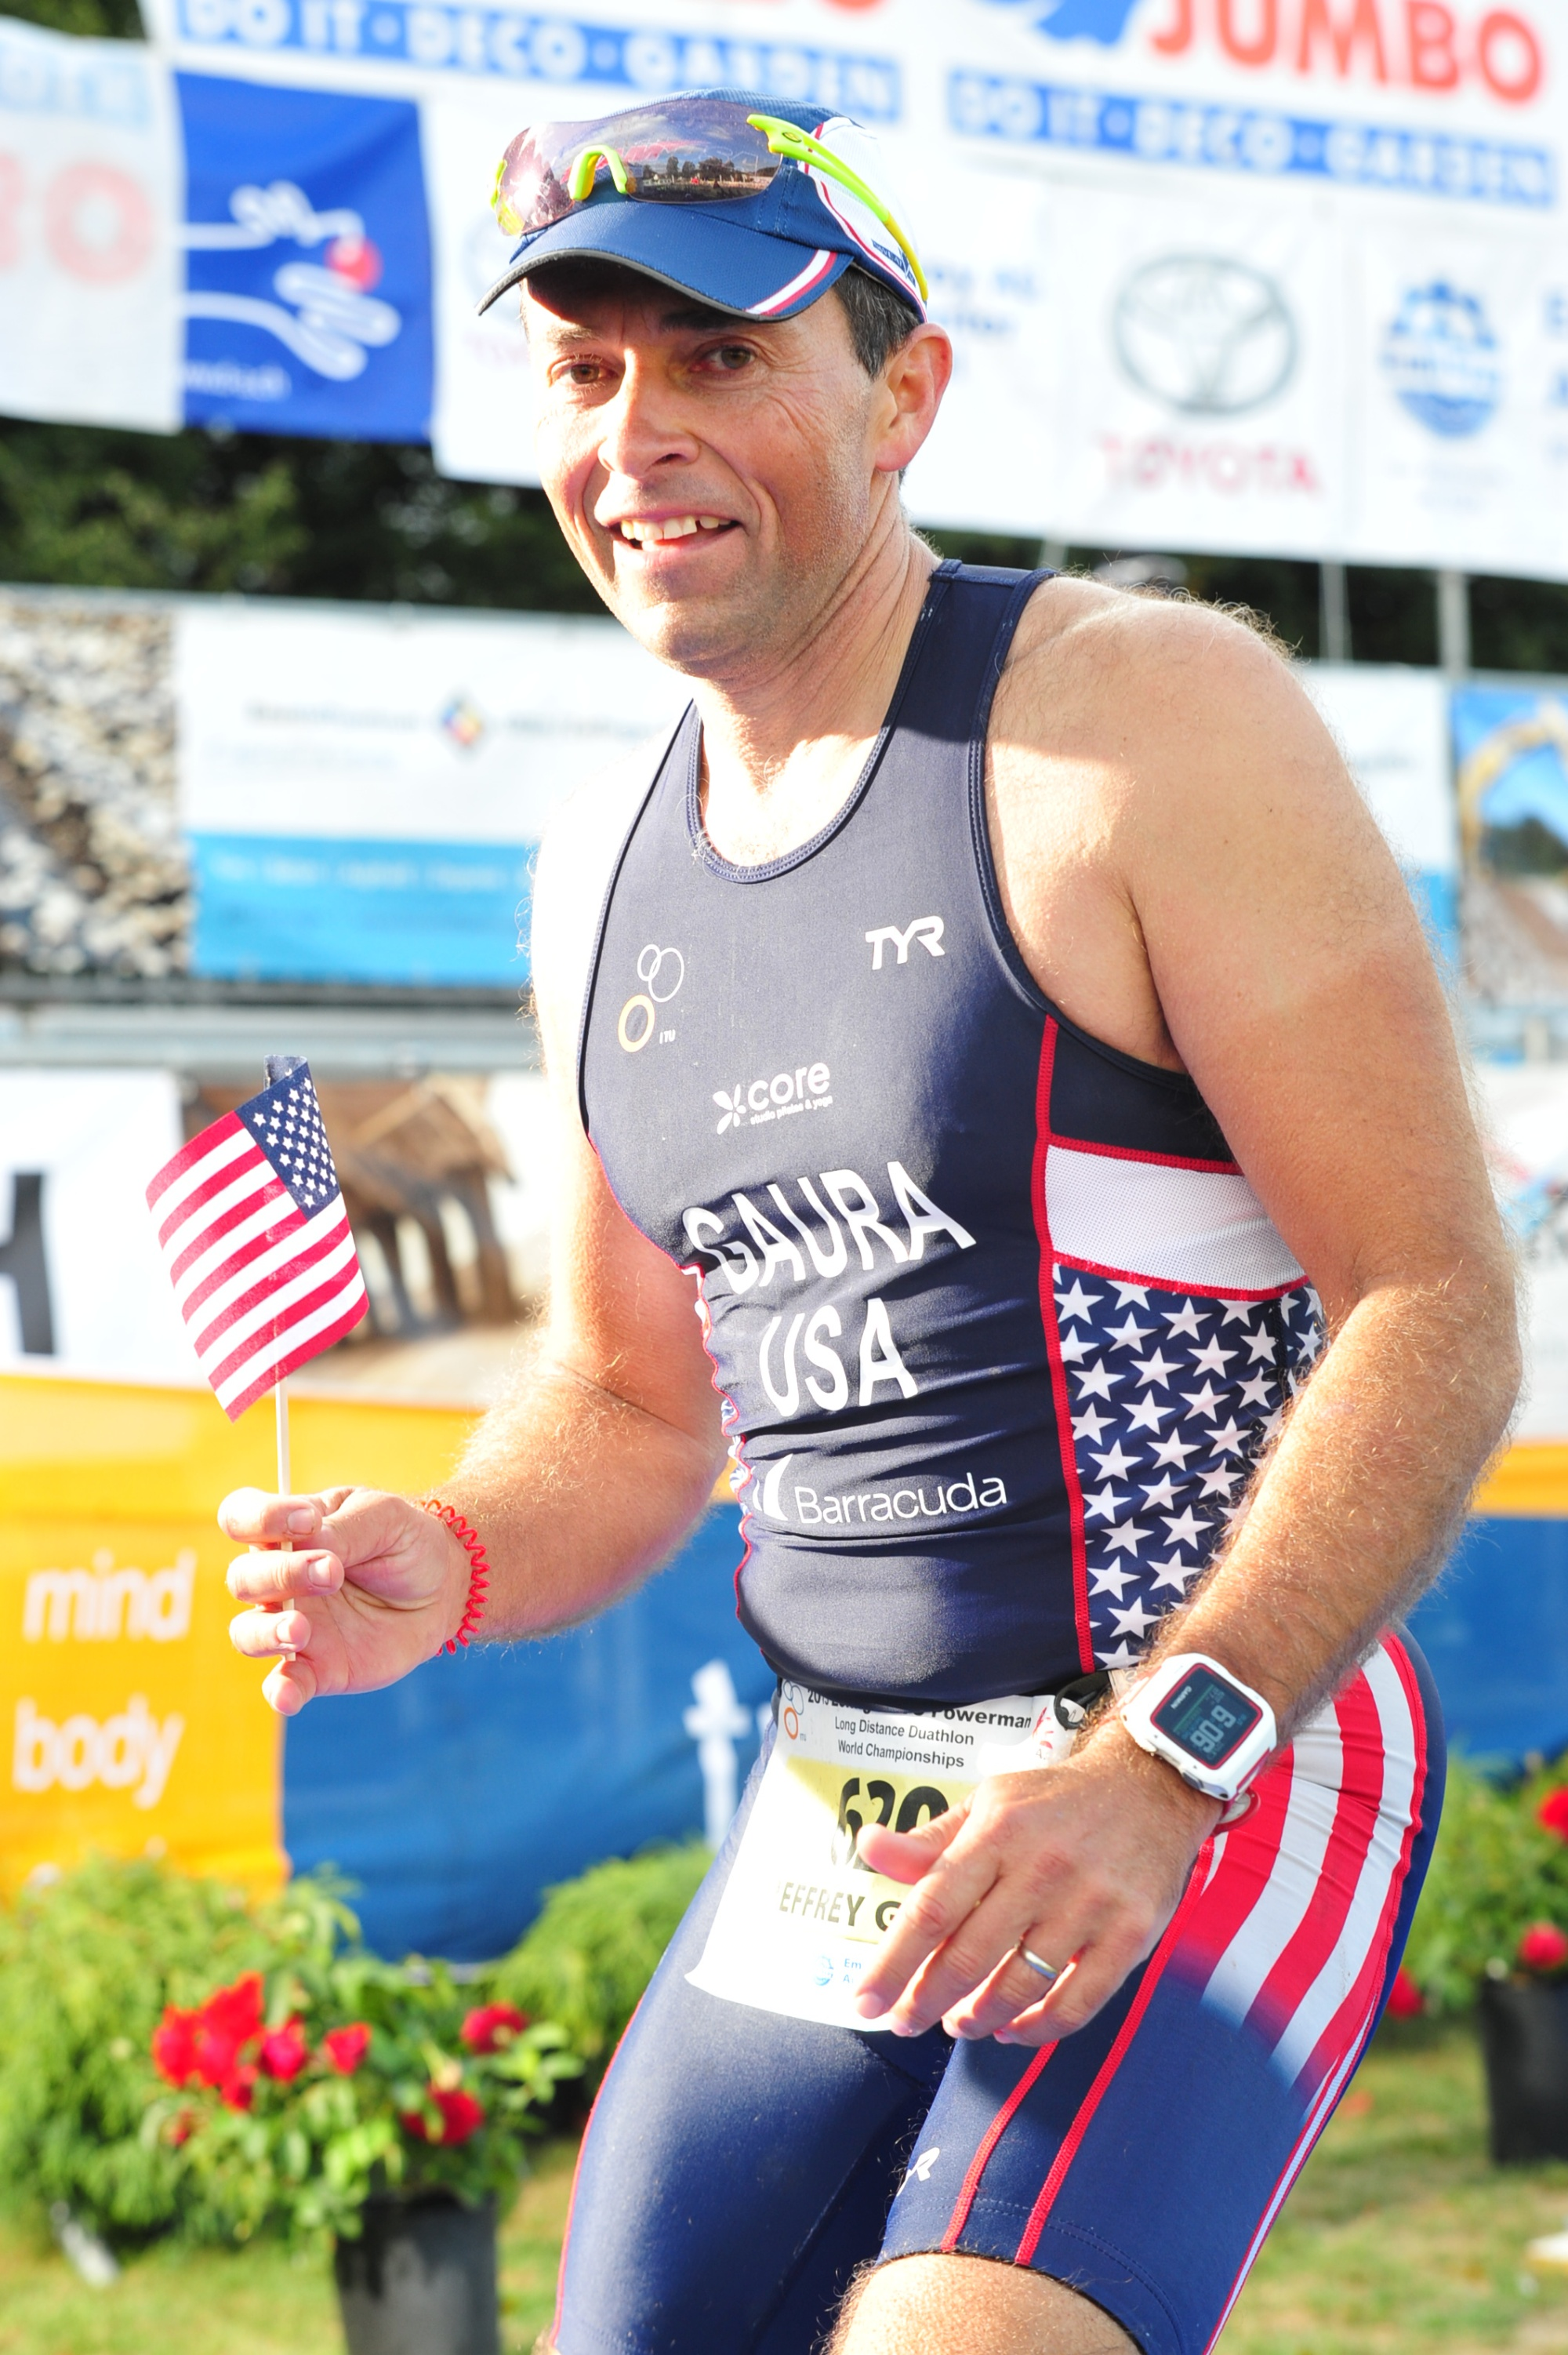 Jeff Gaura at the finish line of Powerman Zofingen